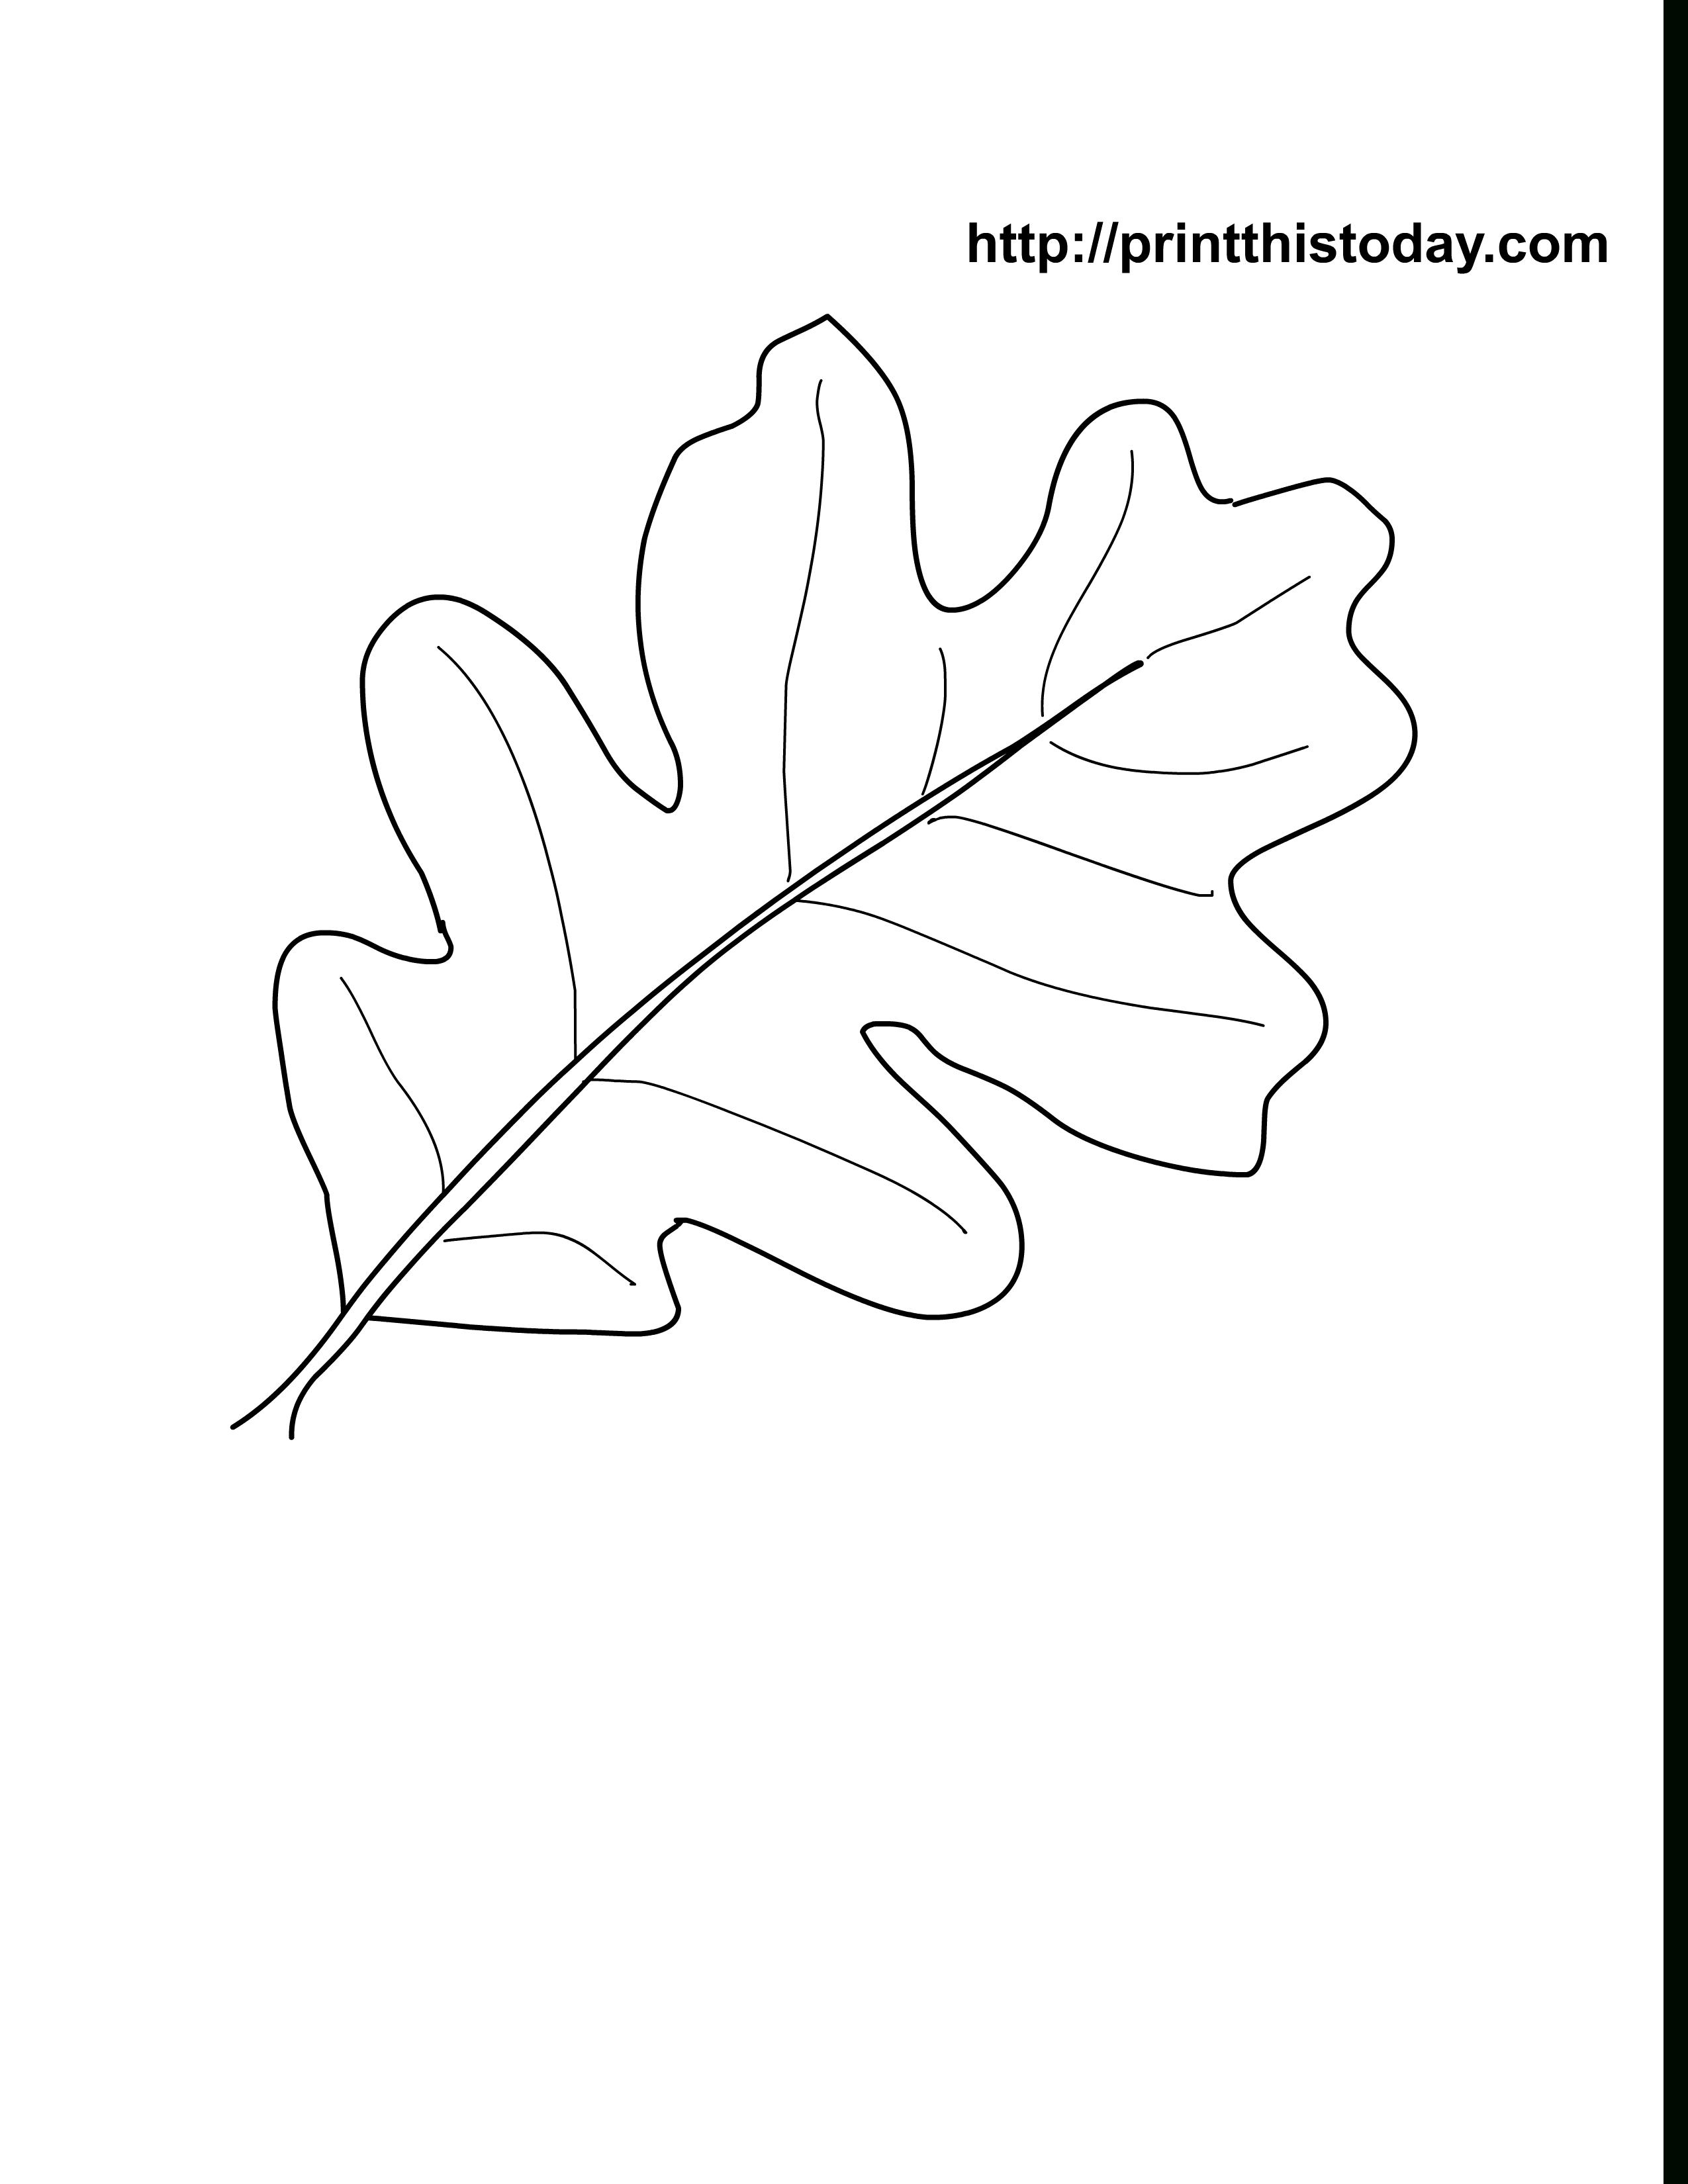 Oak Leaves Coloring Pages Printable | Craft Ideas | Pinterest - Free Printable Oak Leaf Patterns